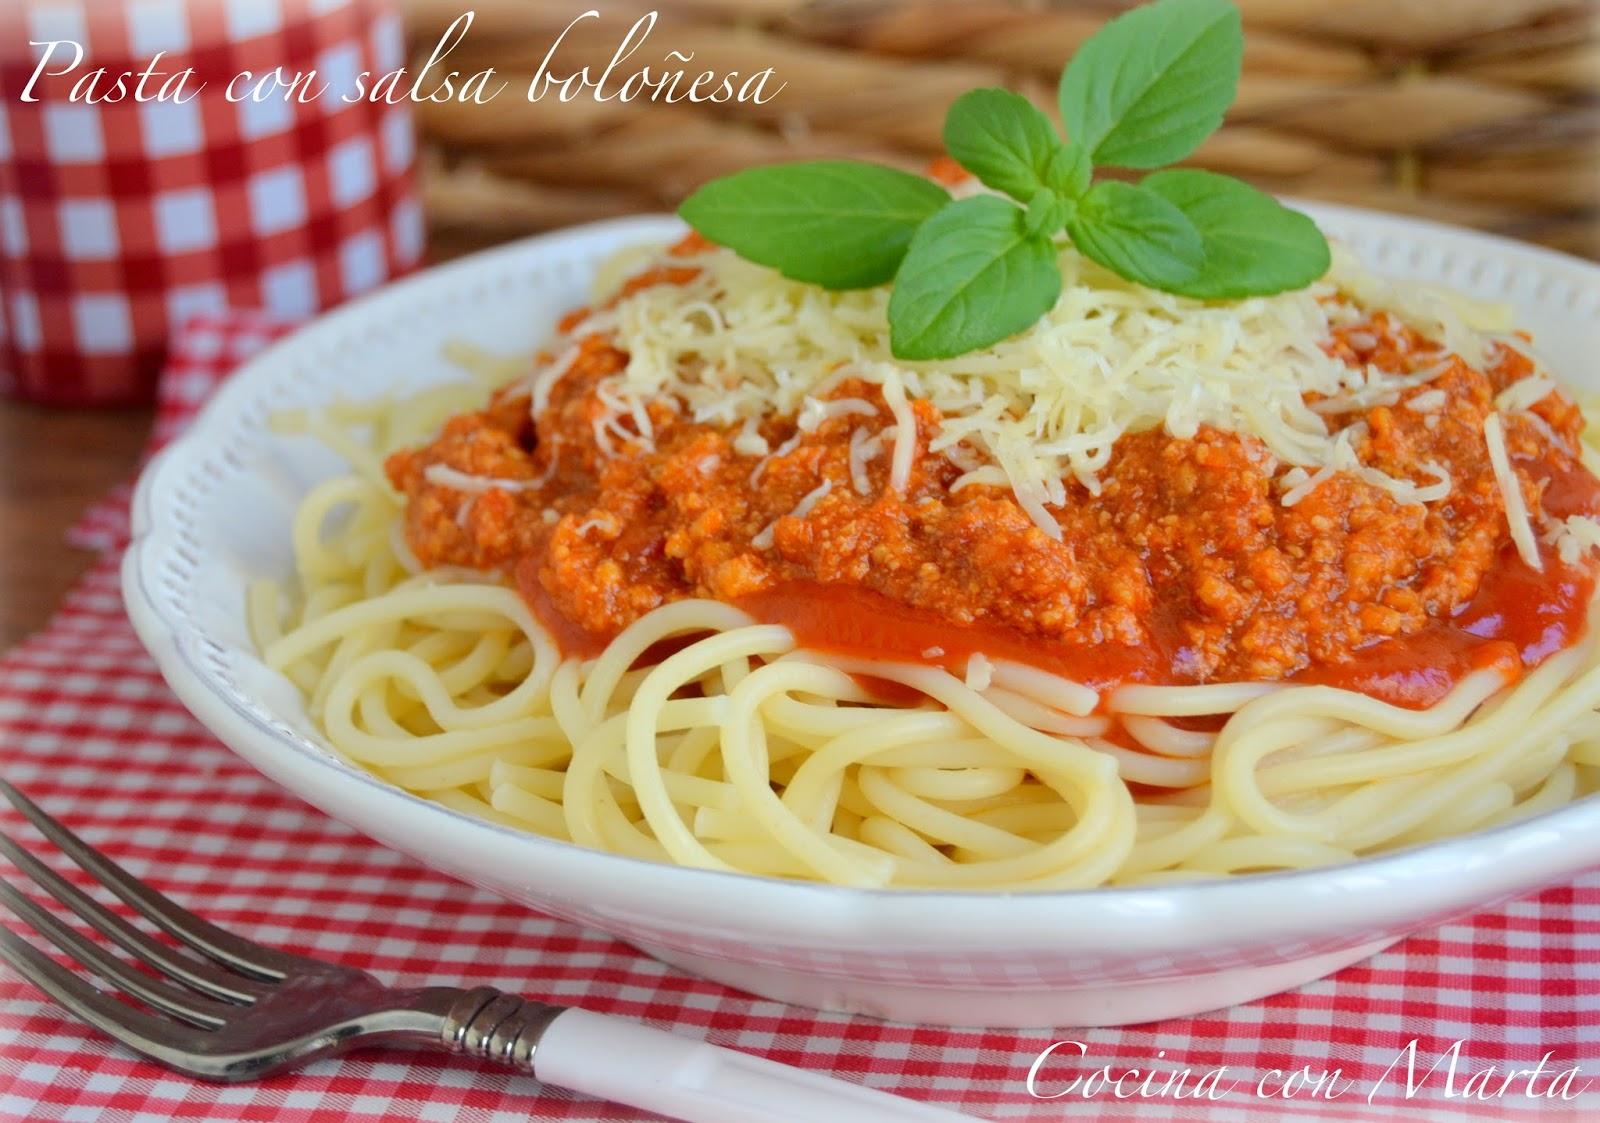 Pasta, macarrones, espaguetis con salsa boloñesa casera. Receta fácil, con y sin Thermomix.